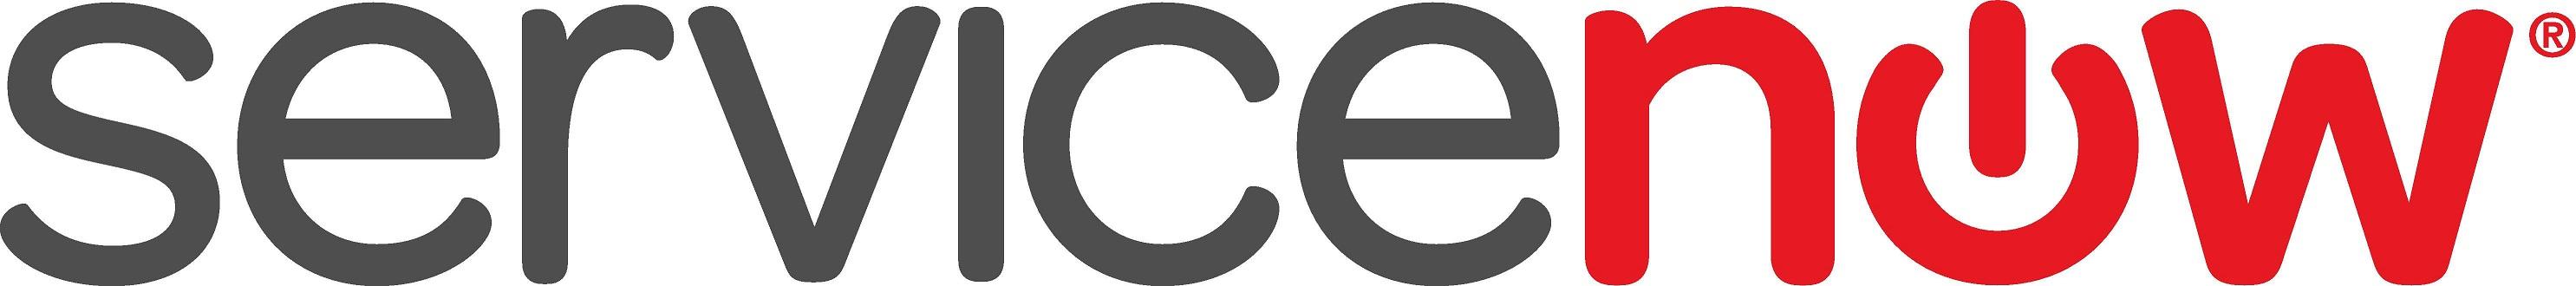 ServiceNow kündigt die Integration der Cloudlösung SAP SuccessFactors Employee Central an